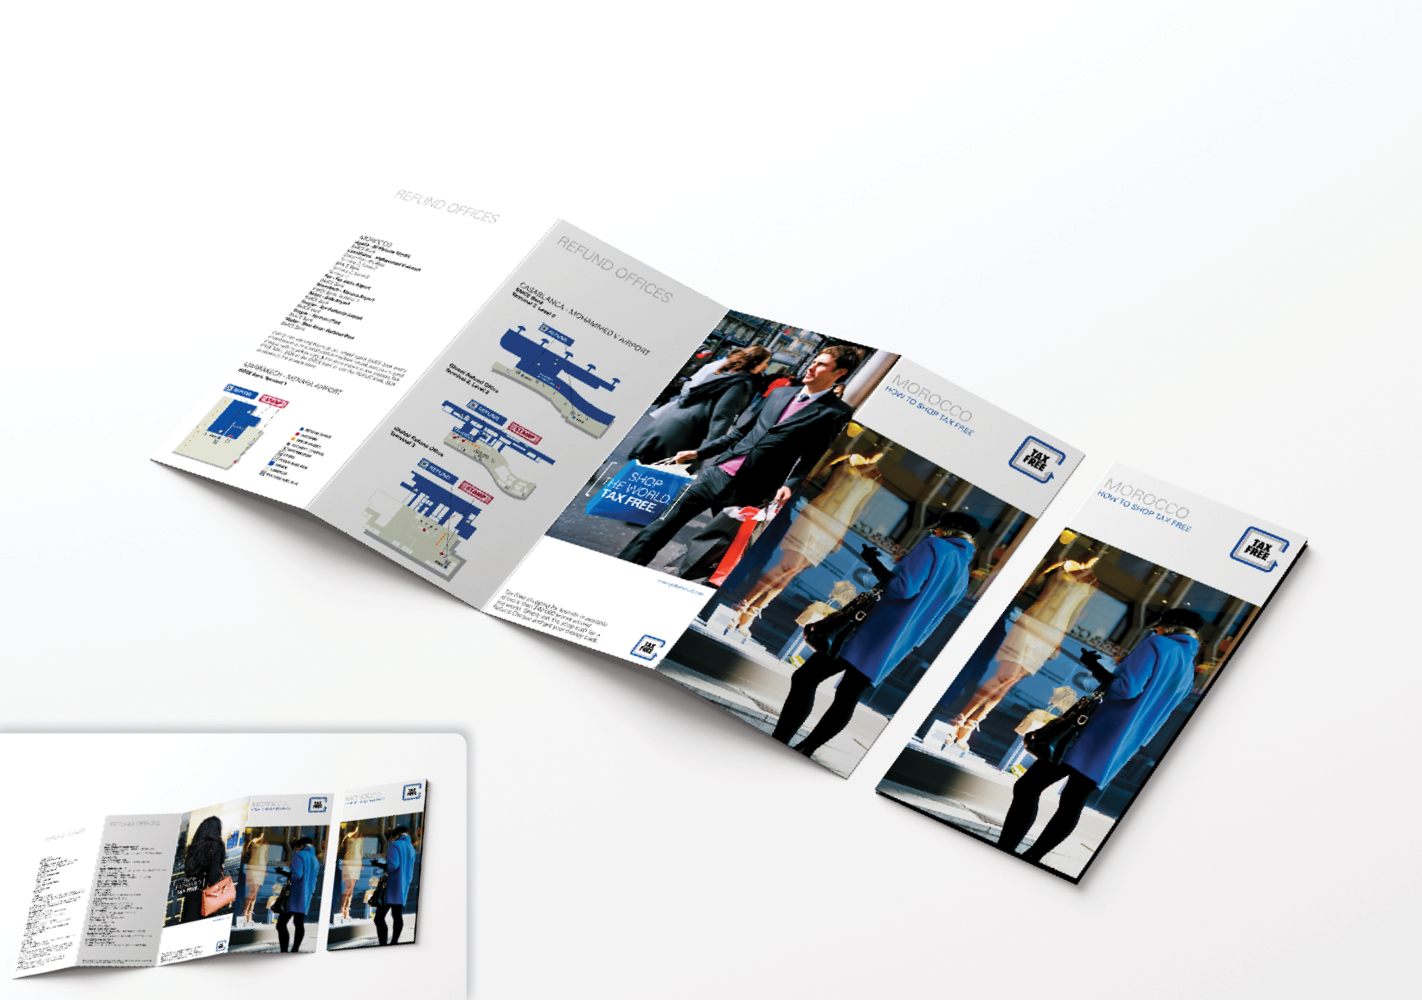 #Dépliant : Adaptation, exécution et impression #Leaflet : Adaptation, execution and printing #Déclinaison #Print